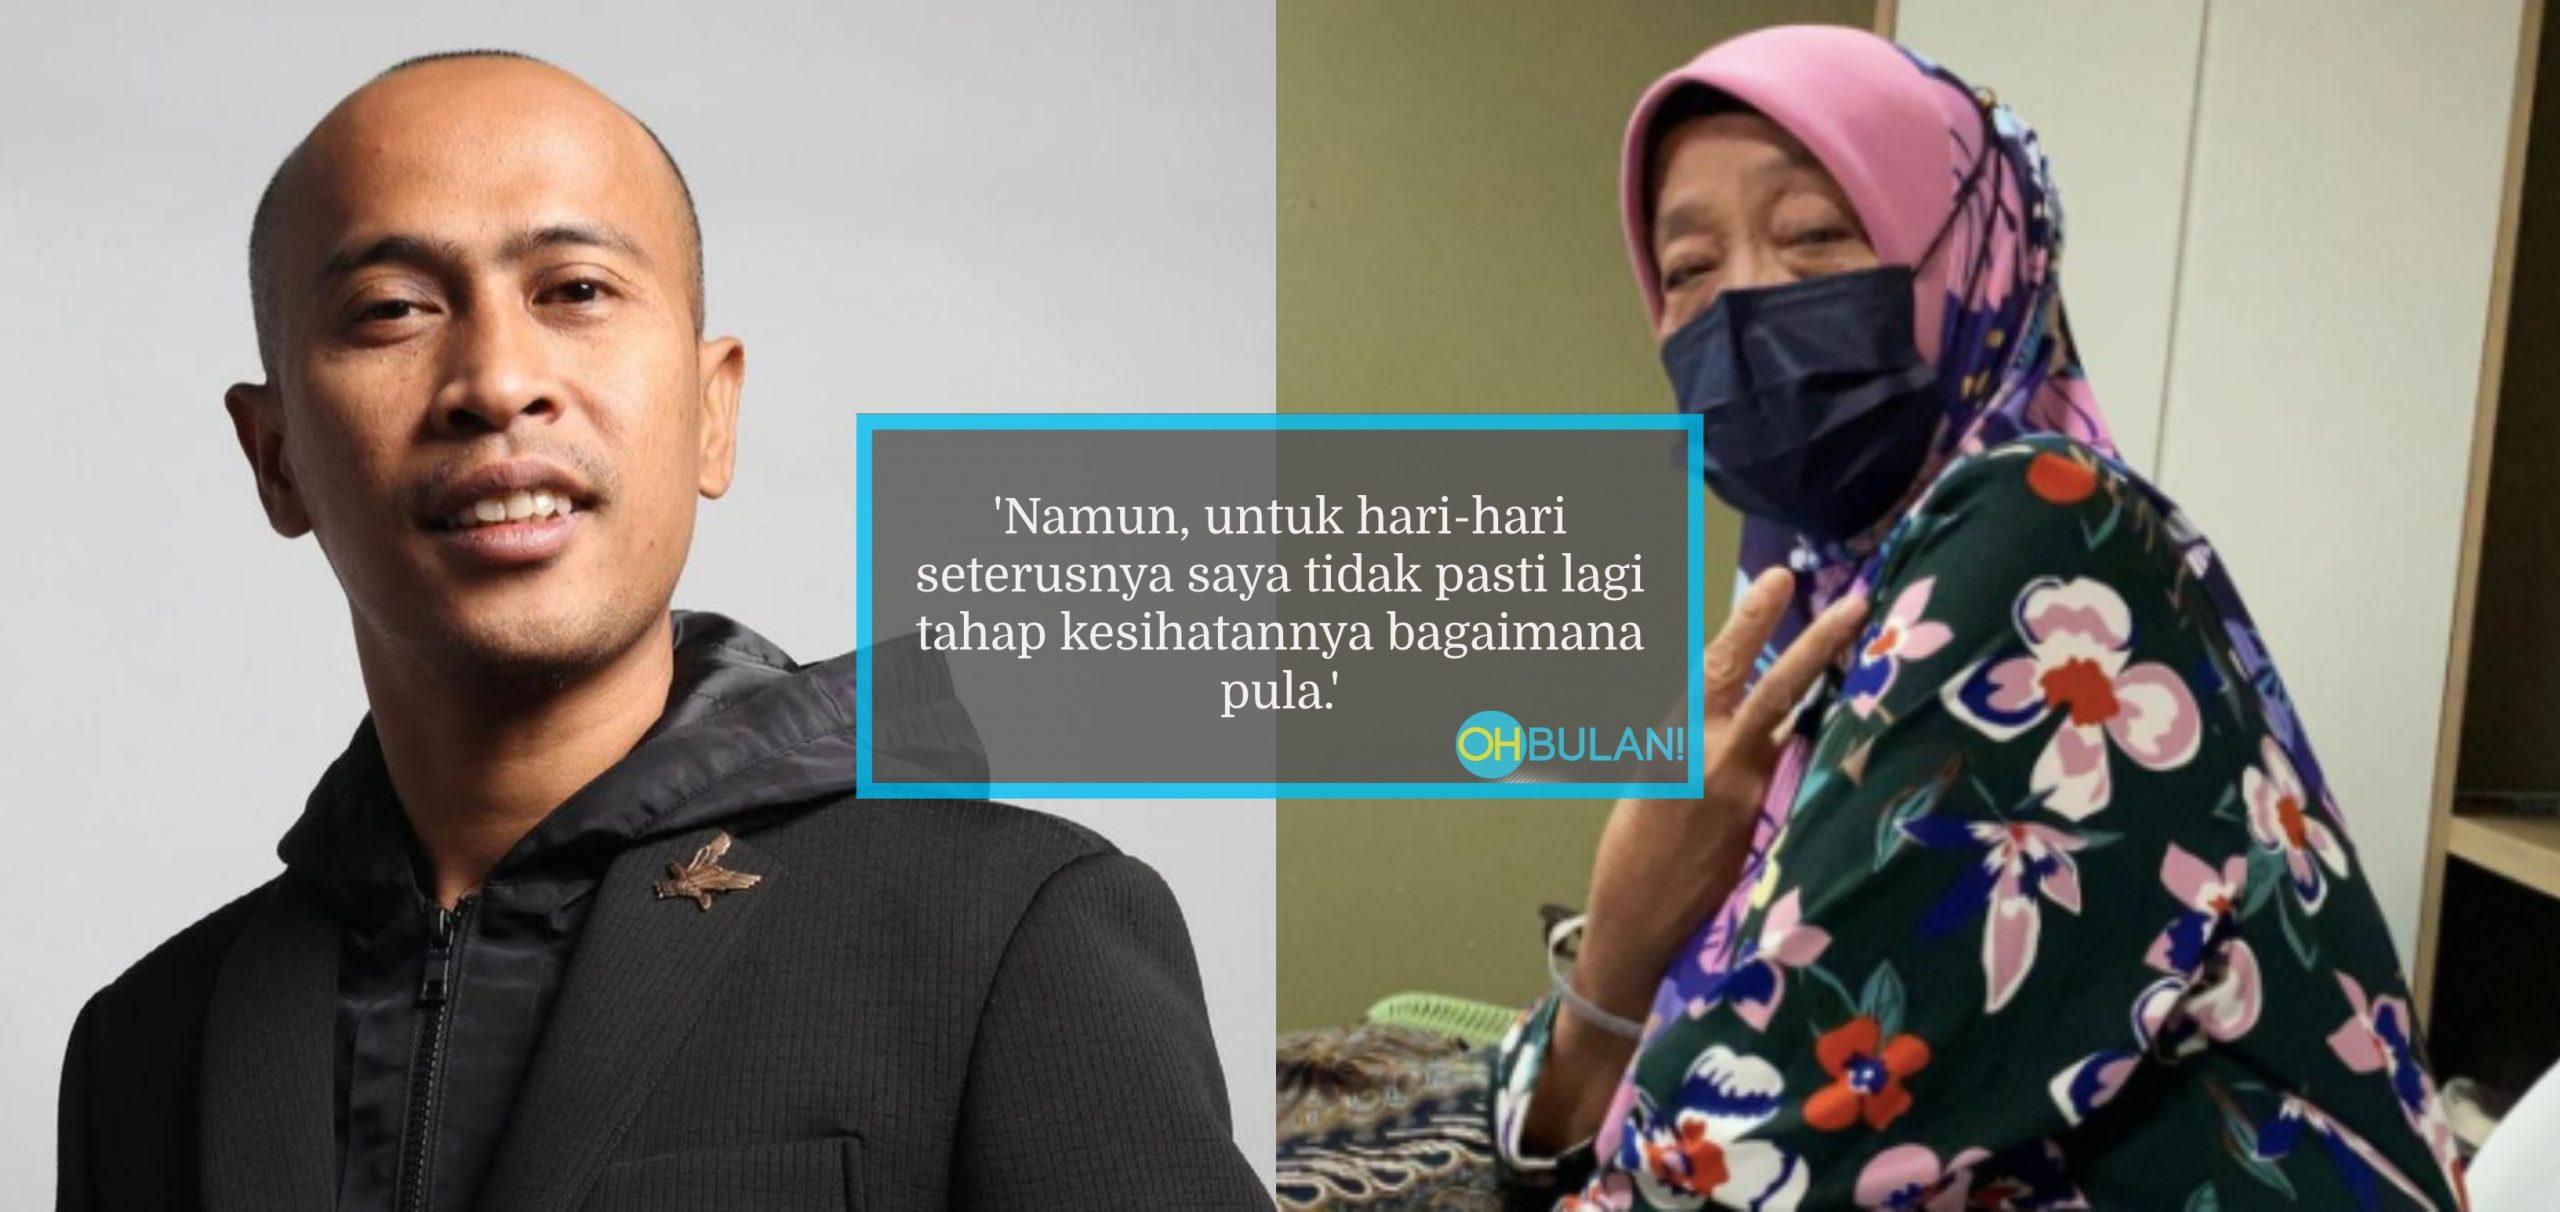 'Emak Sudah Sedar, Keadaan Semakin Stabil' – Achey